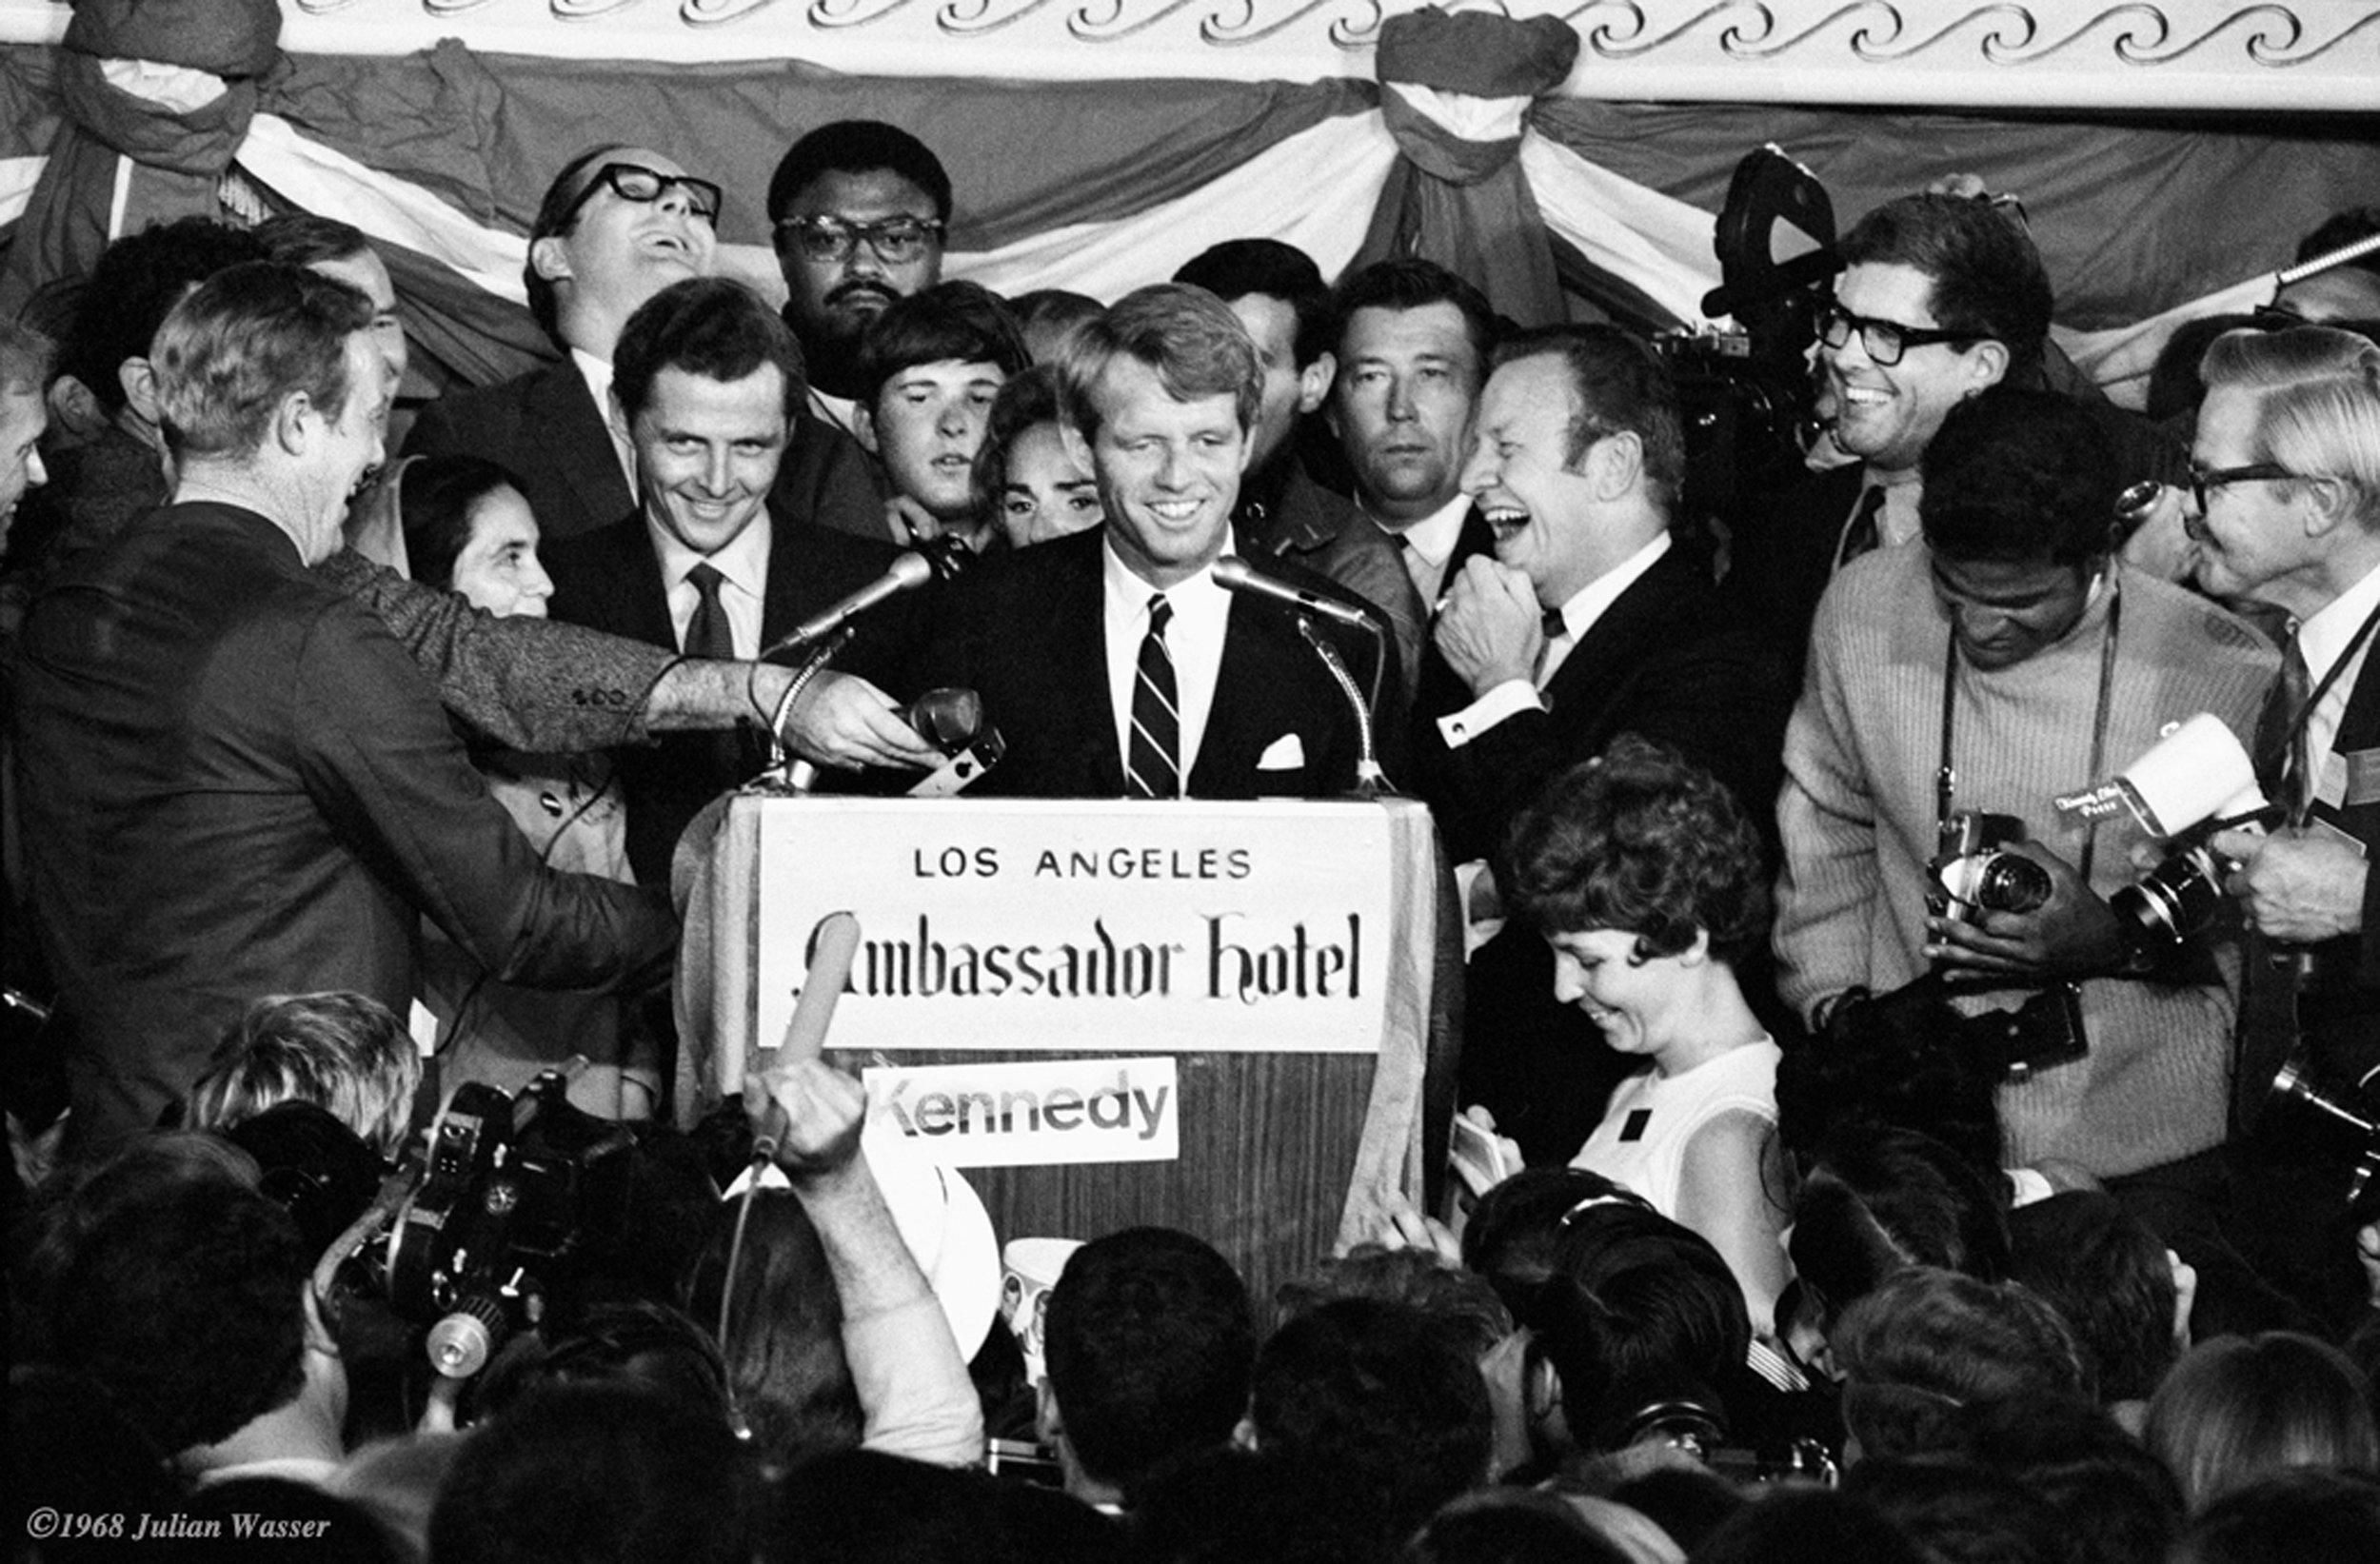 Robert F Kennedy Ambasador Hotel June 1968, photo credit Julian Wasser.jpg